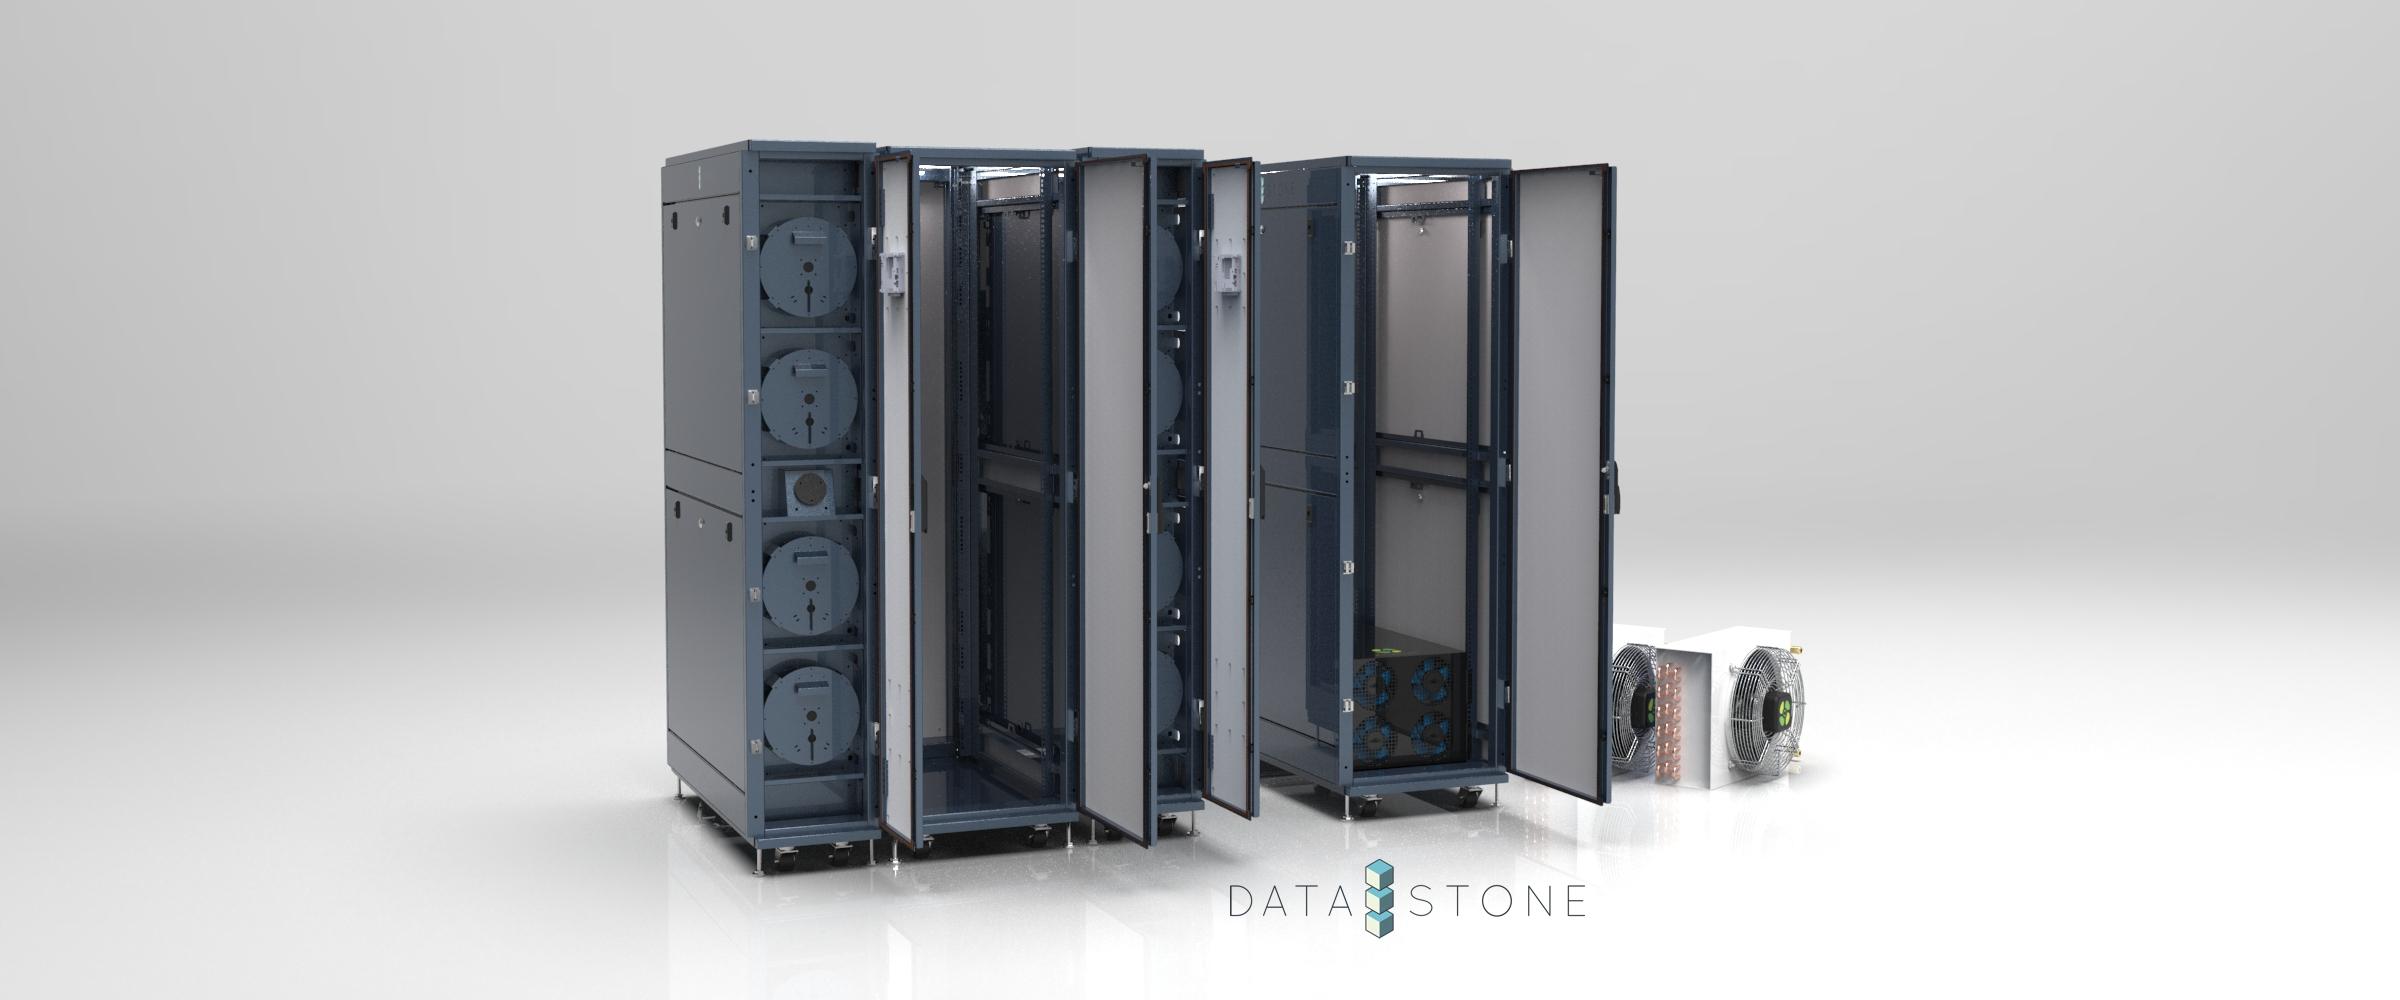 Micro Data Center DataStone